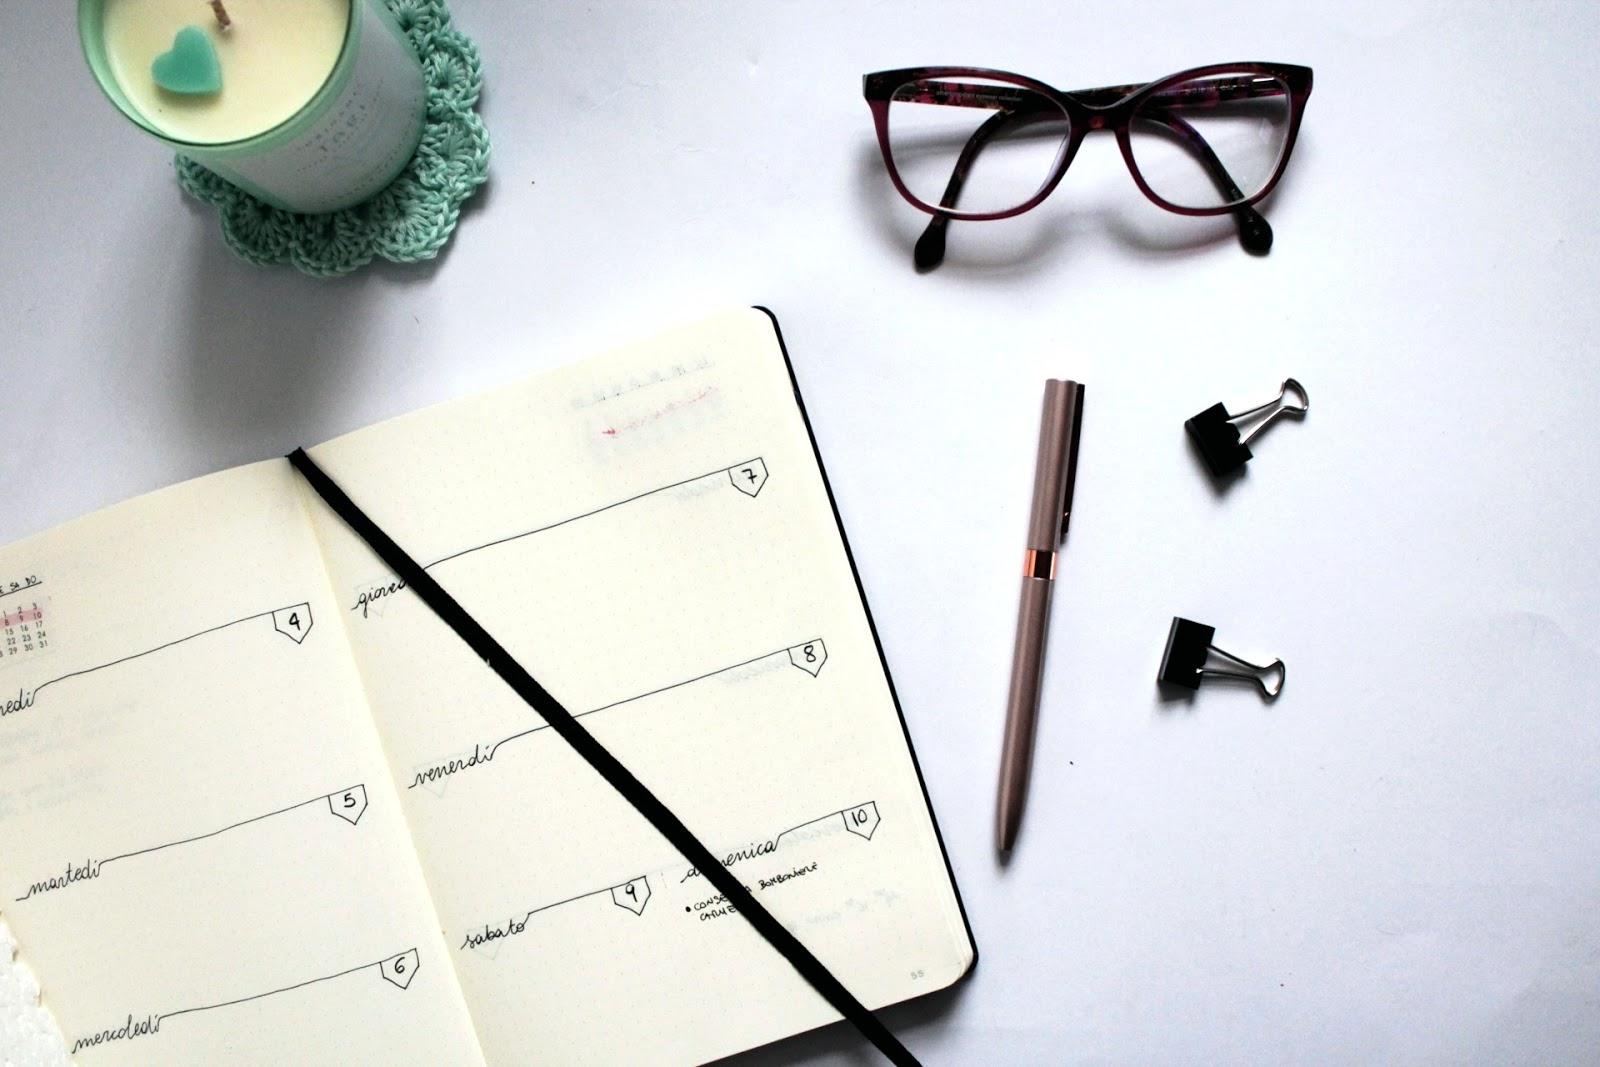 Learn Italian basics and Italian words: days of the week